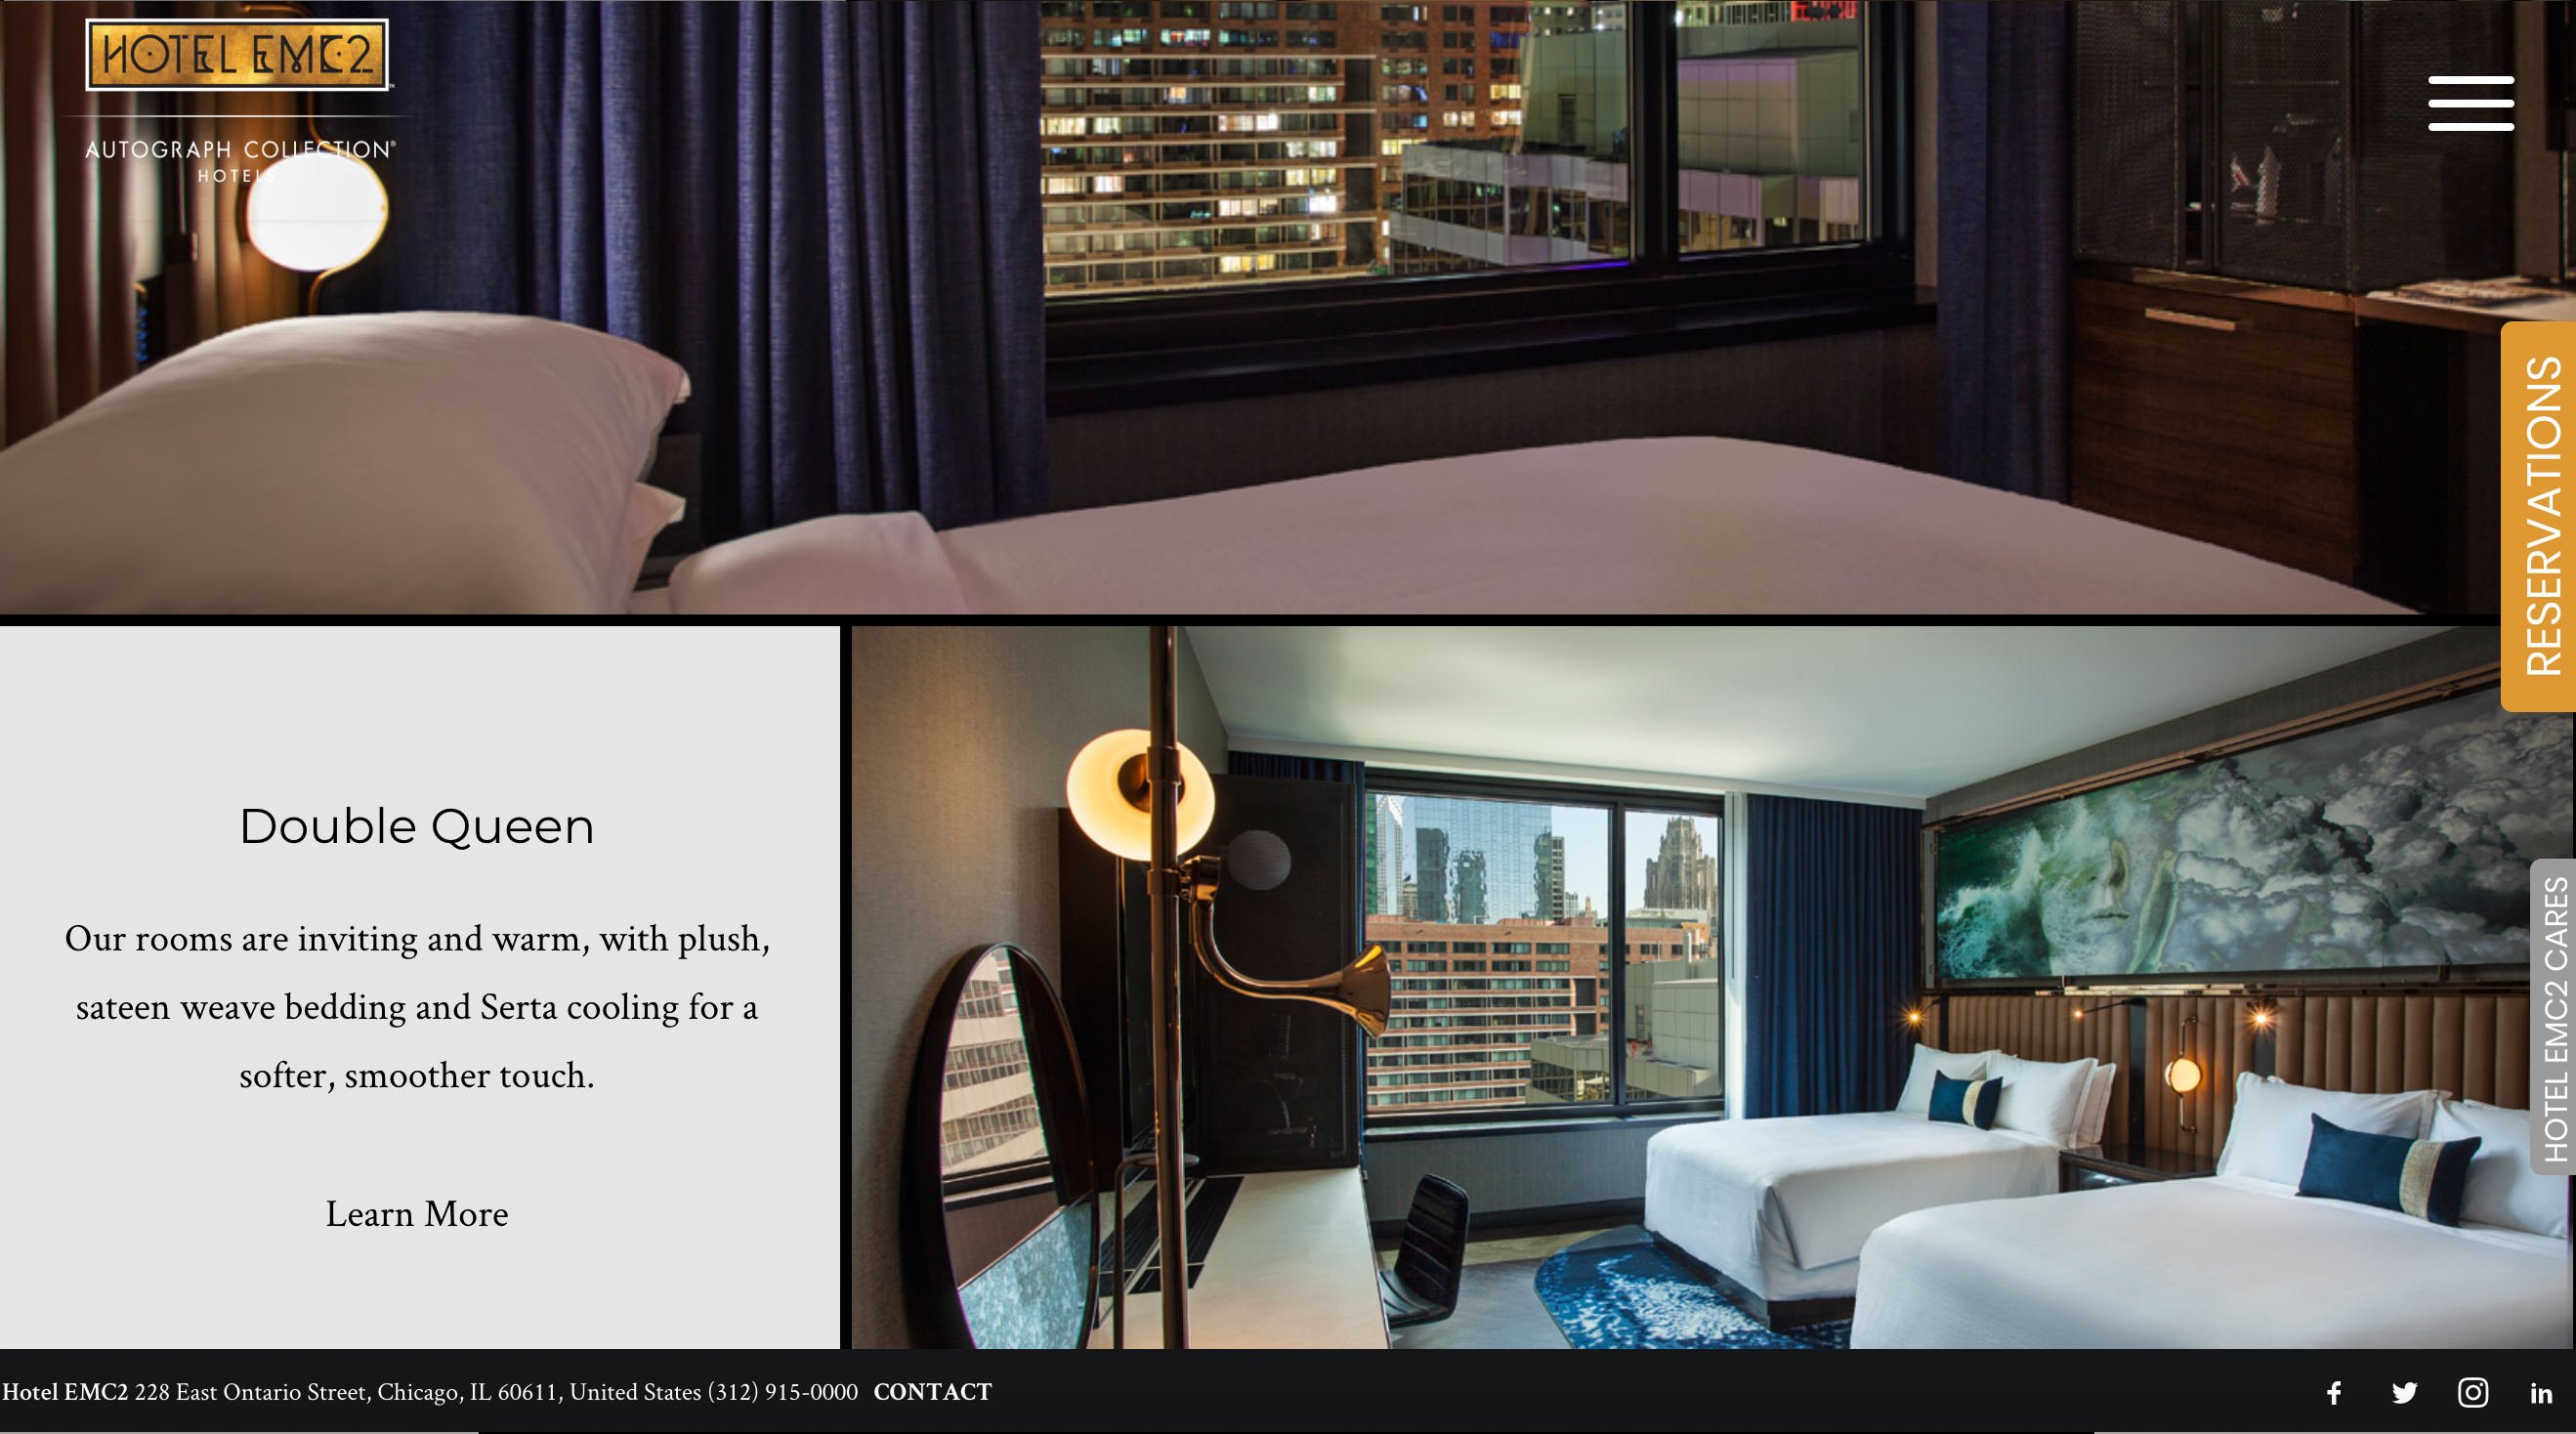 Hotel EMC2 Website 3